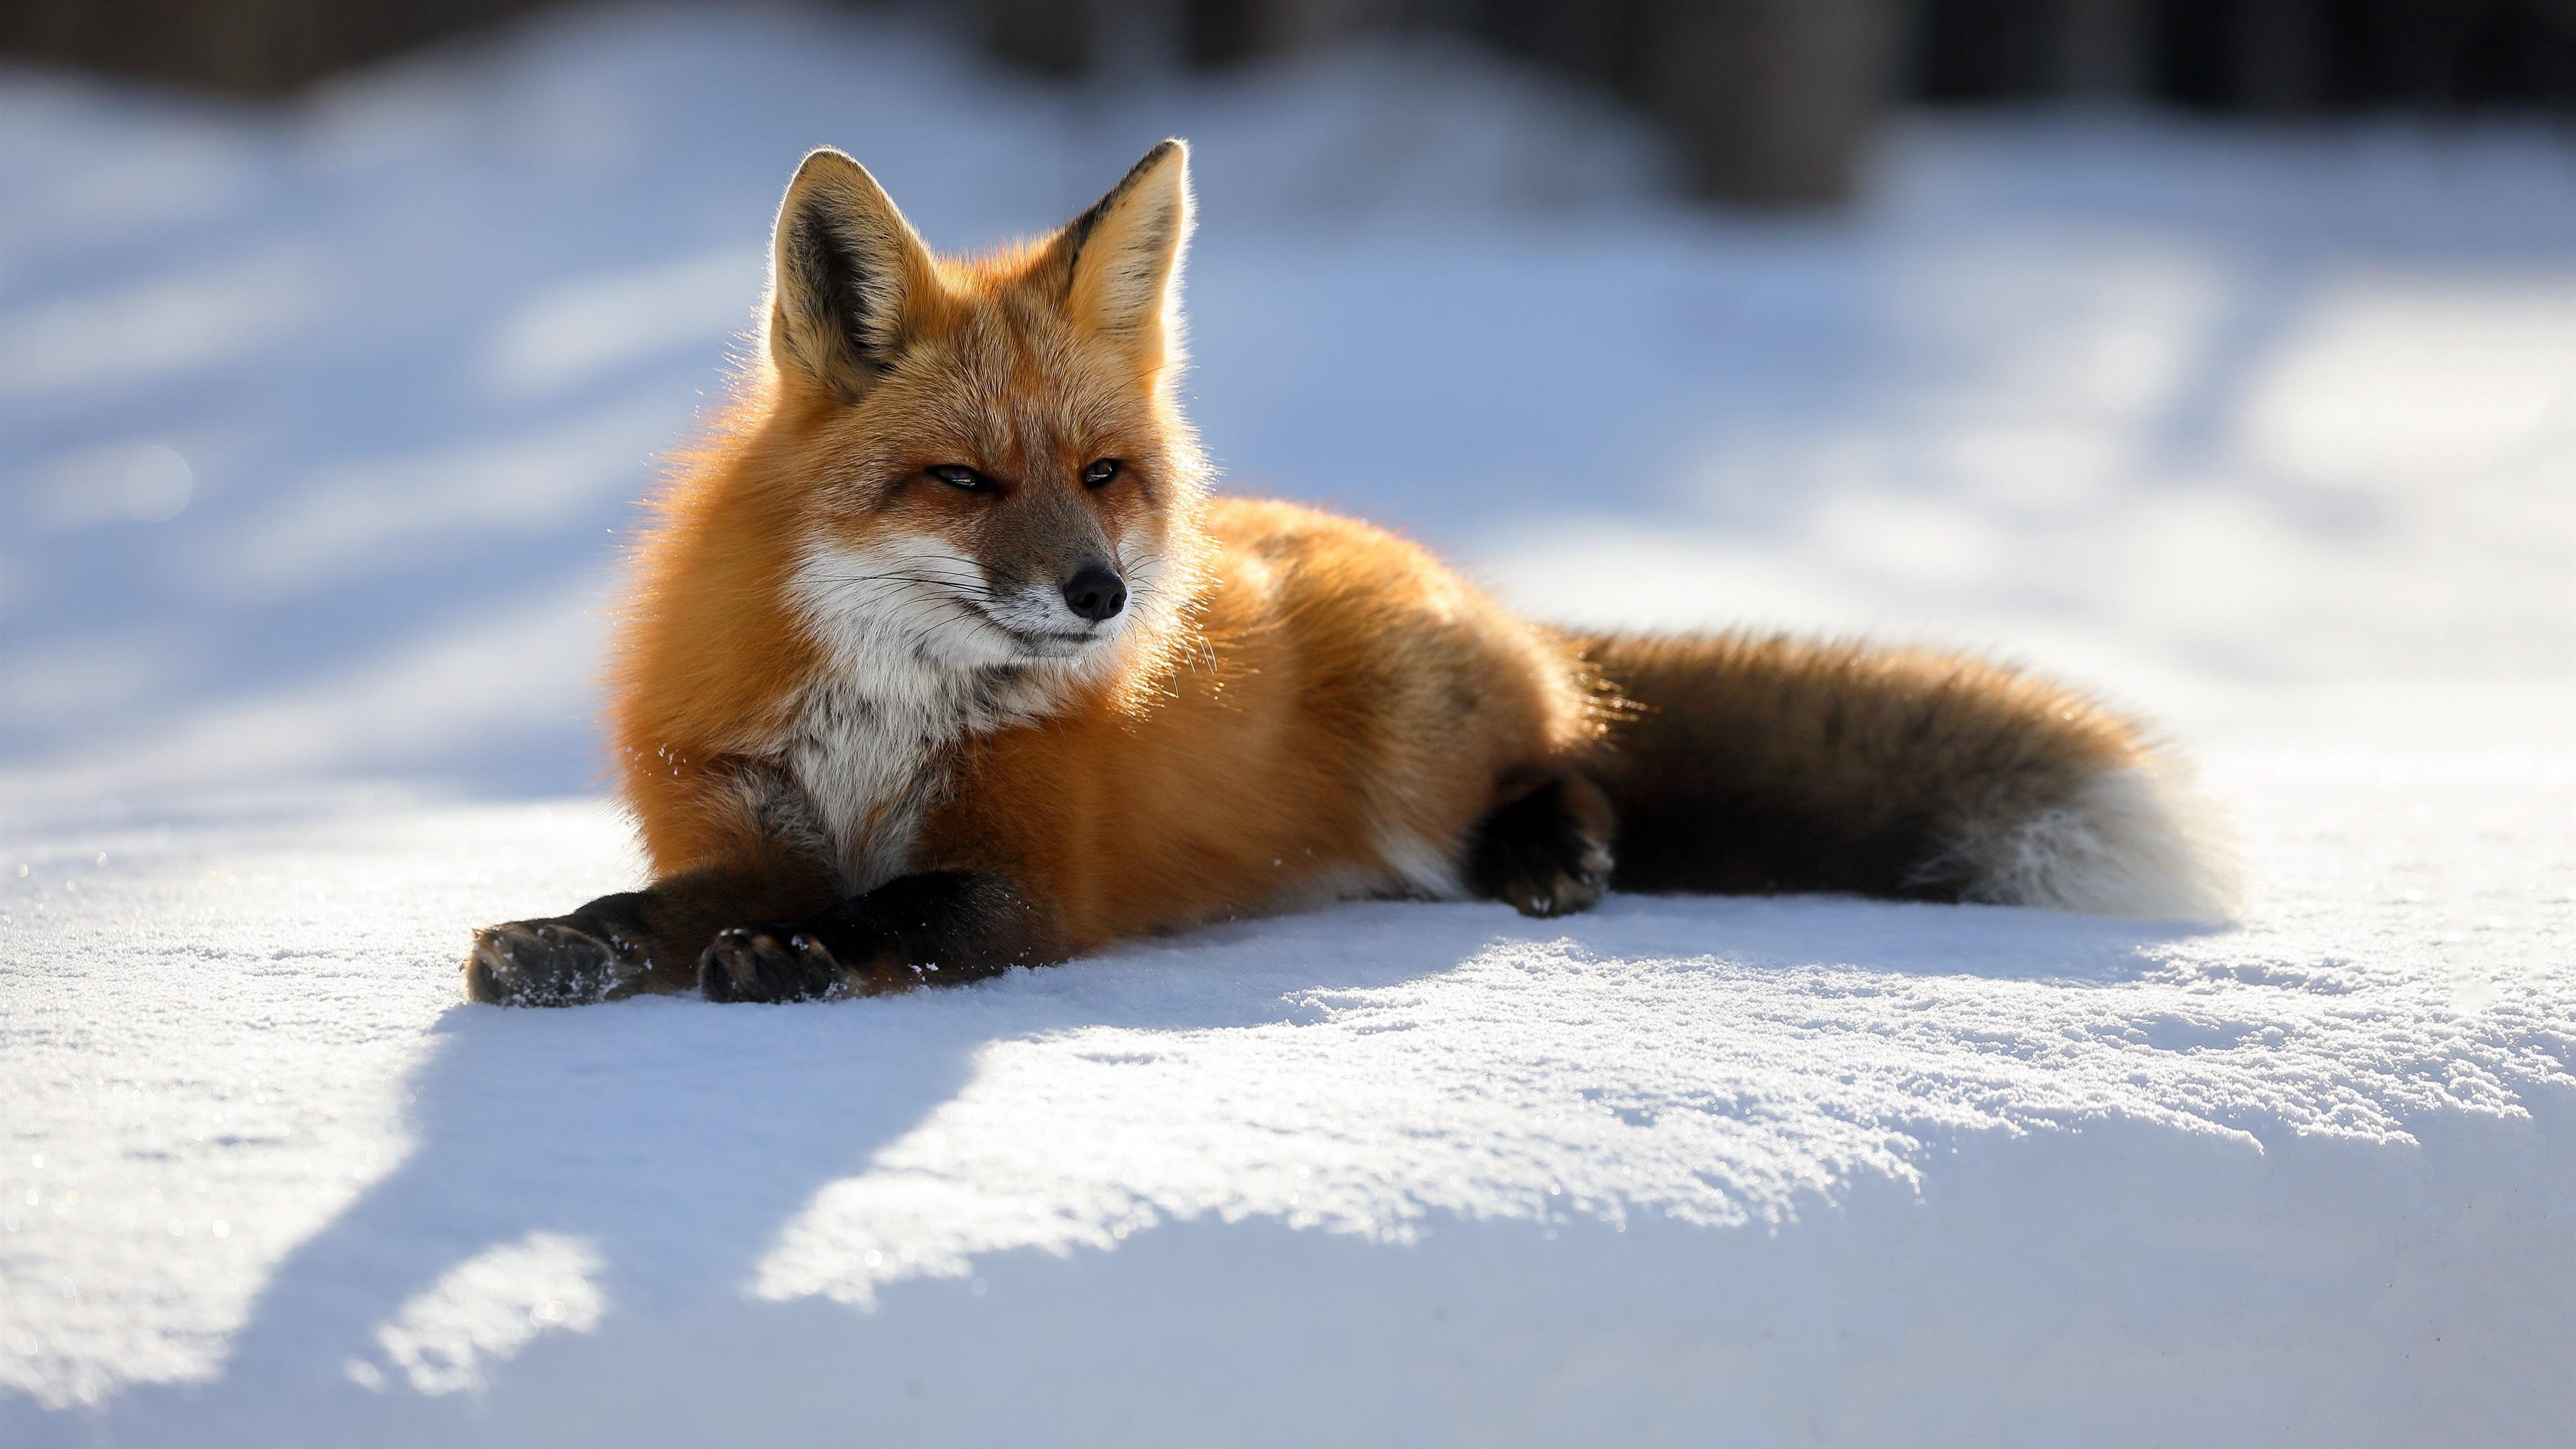 Fondos De Pantalla Lindo Zorro Nieve Invierno 3840x2160